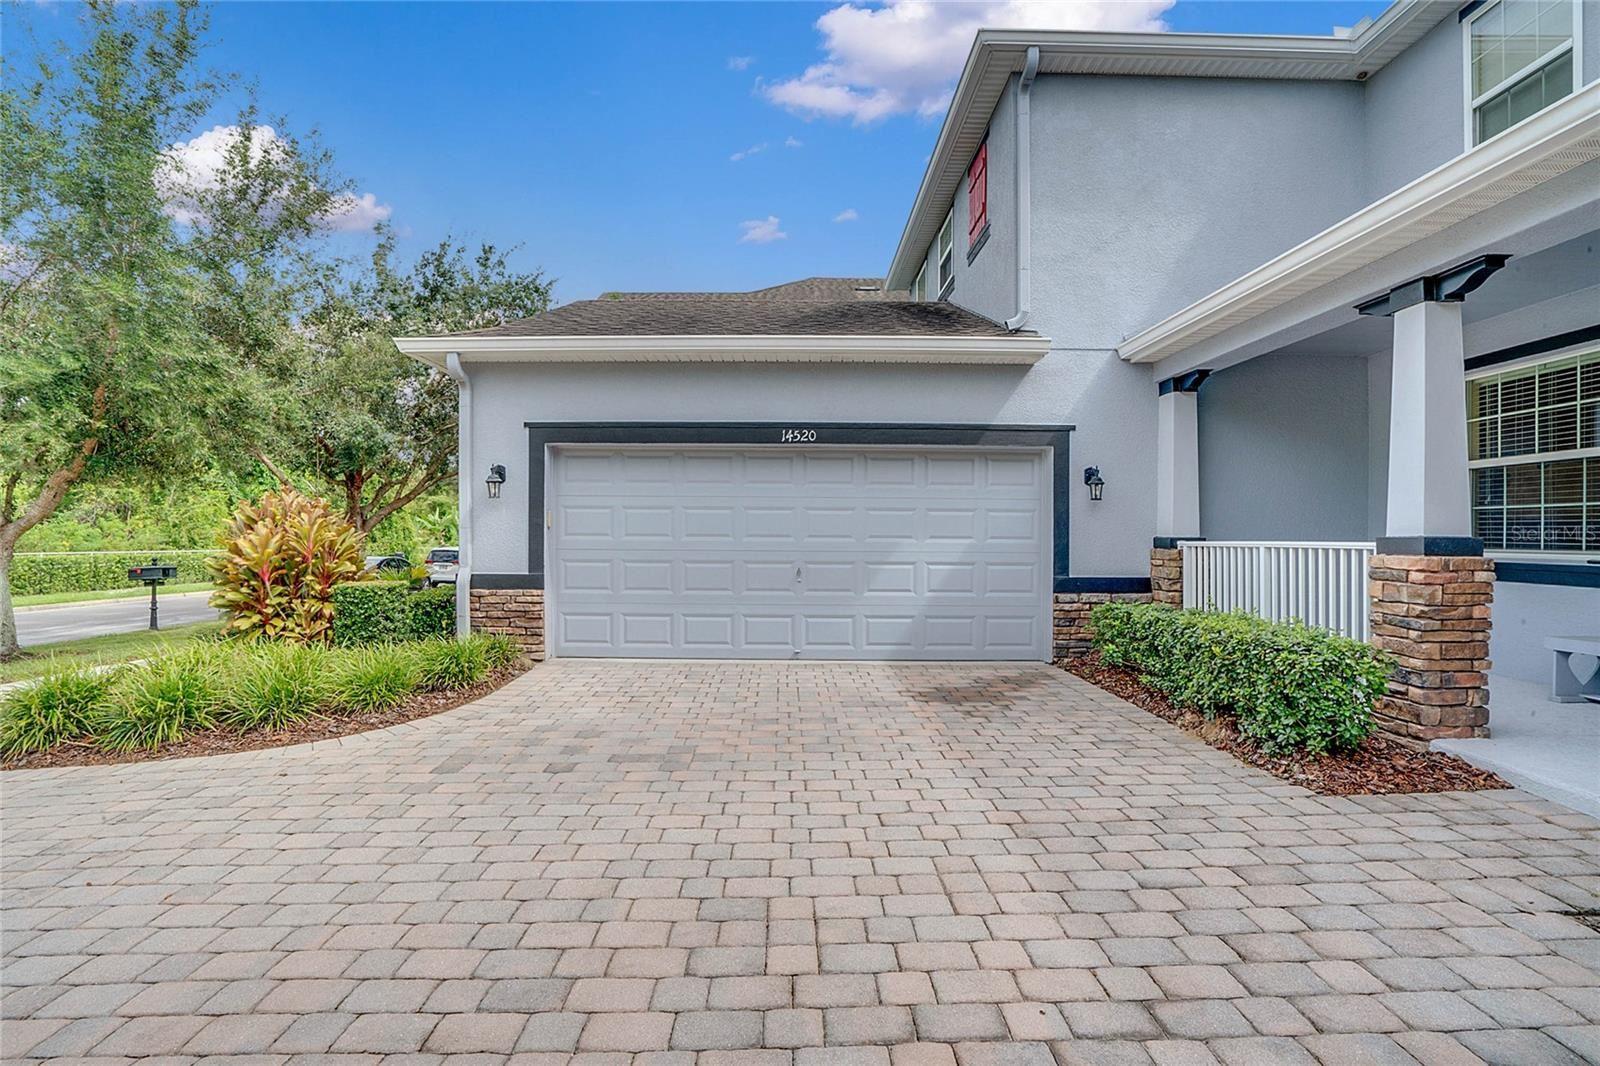 Photo of 14520 PORTER ROAD, WINTER GARDEN, FL 34787 (MLS # O5974984)